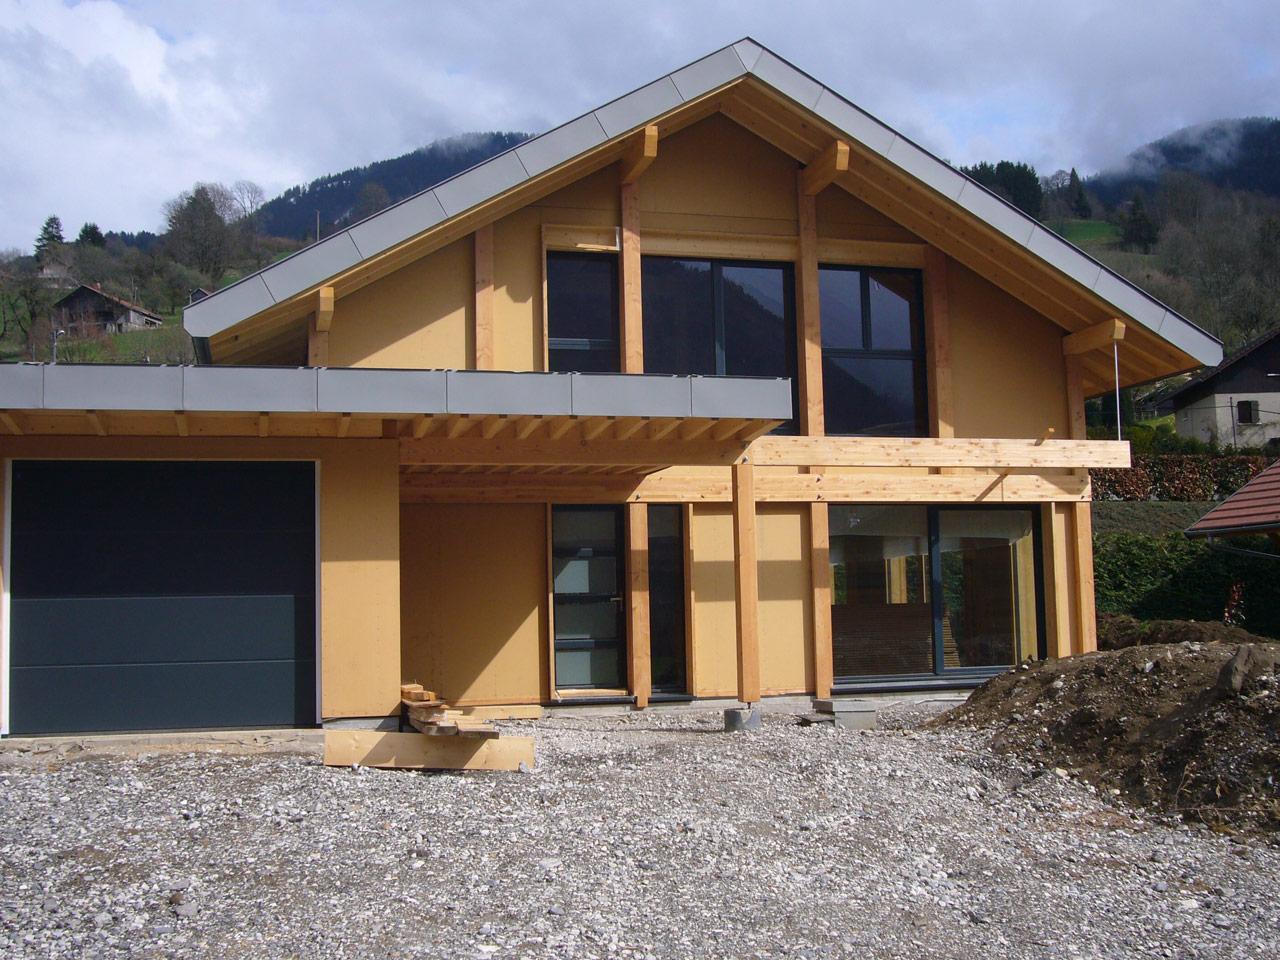 Ossature bois th nes alternative construction bois for Amelioration isolation maison